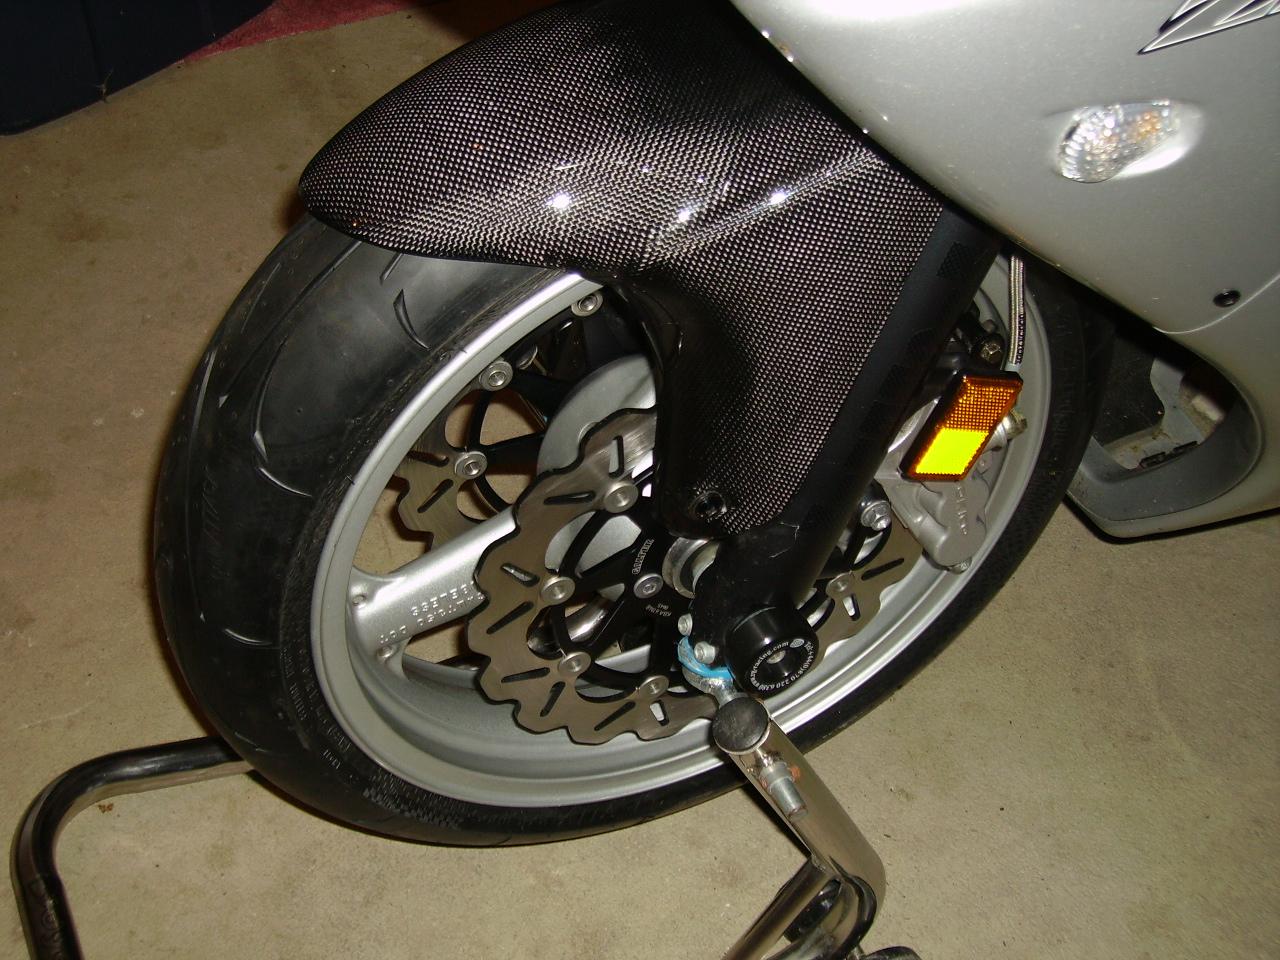 2008 kawasaki zzr600 fuse box location product wiring diagrams \u2022 2007 kawasaki ninja zx6r zx6r zzr600 05 what isnt the same sportbikes net rh sportbikes net 2008 kawasaki zzr600 slip